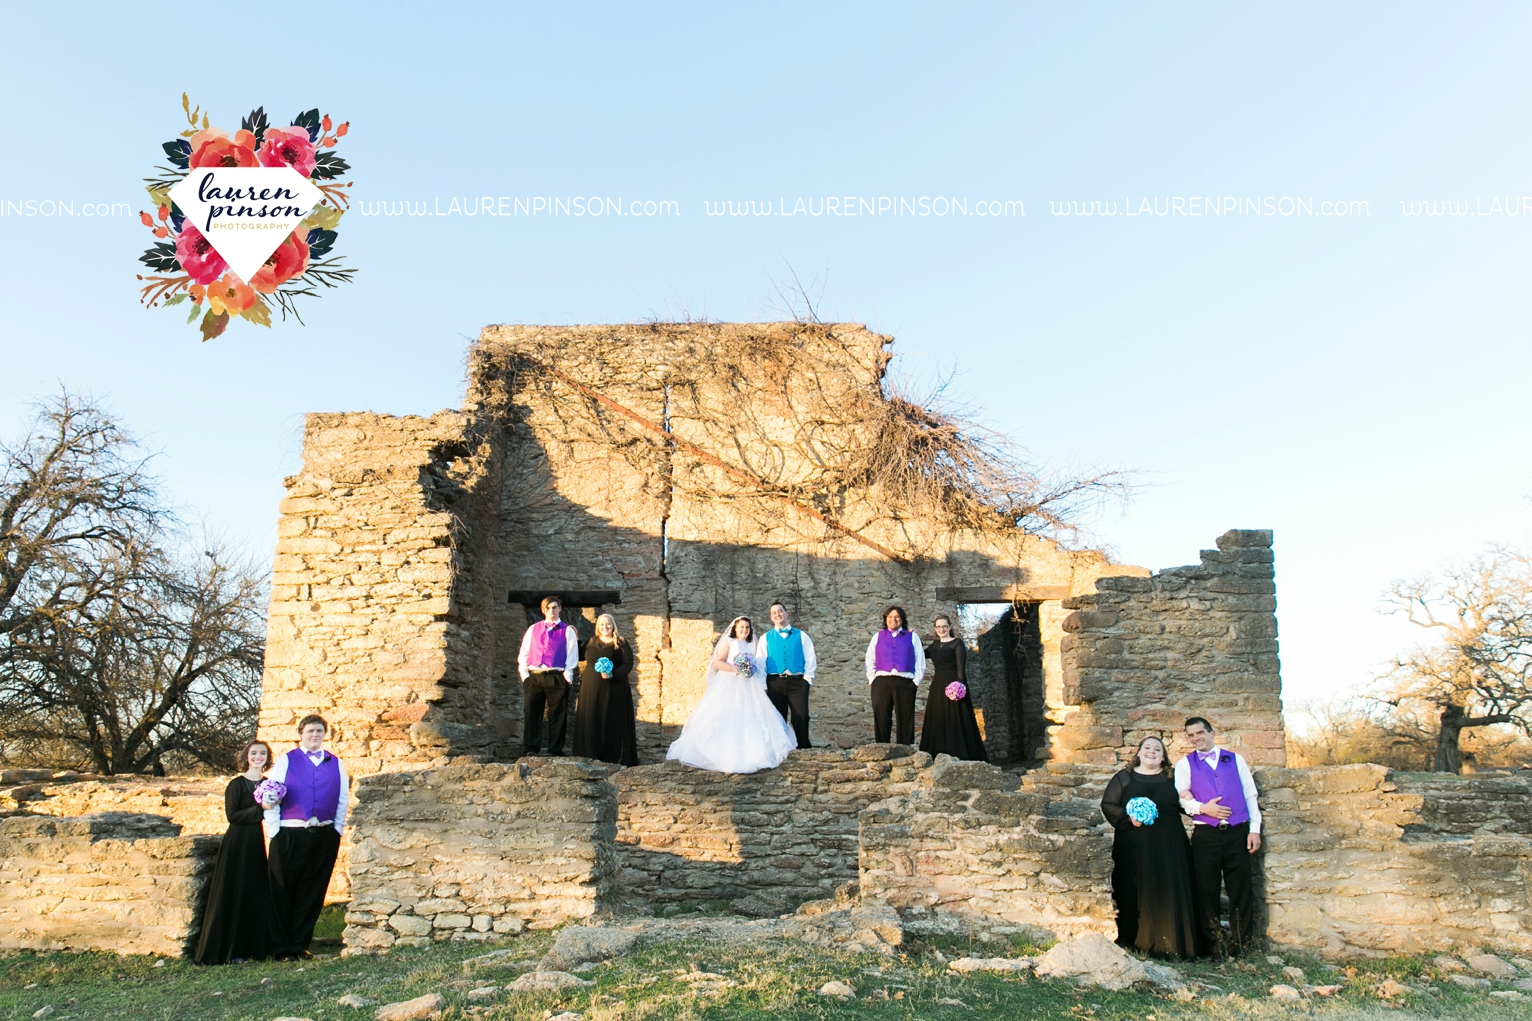 durant-oklahoma-methodist-church-fort-washita-wedding-photographer-00017.jpg